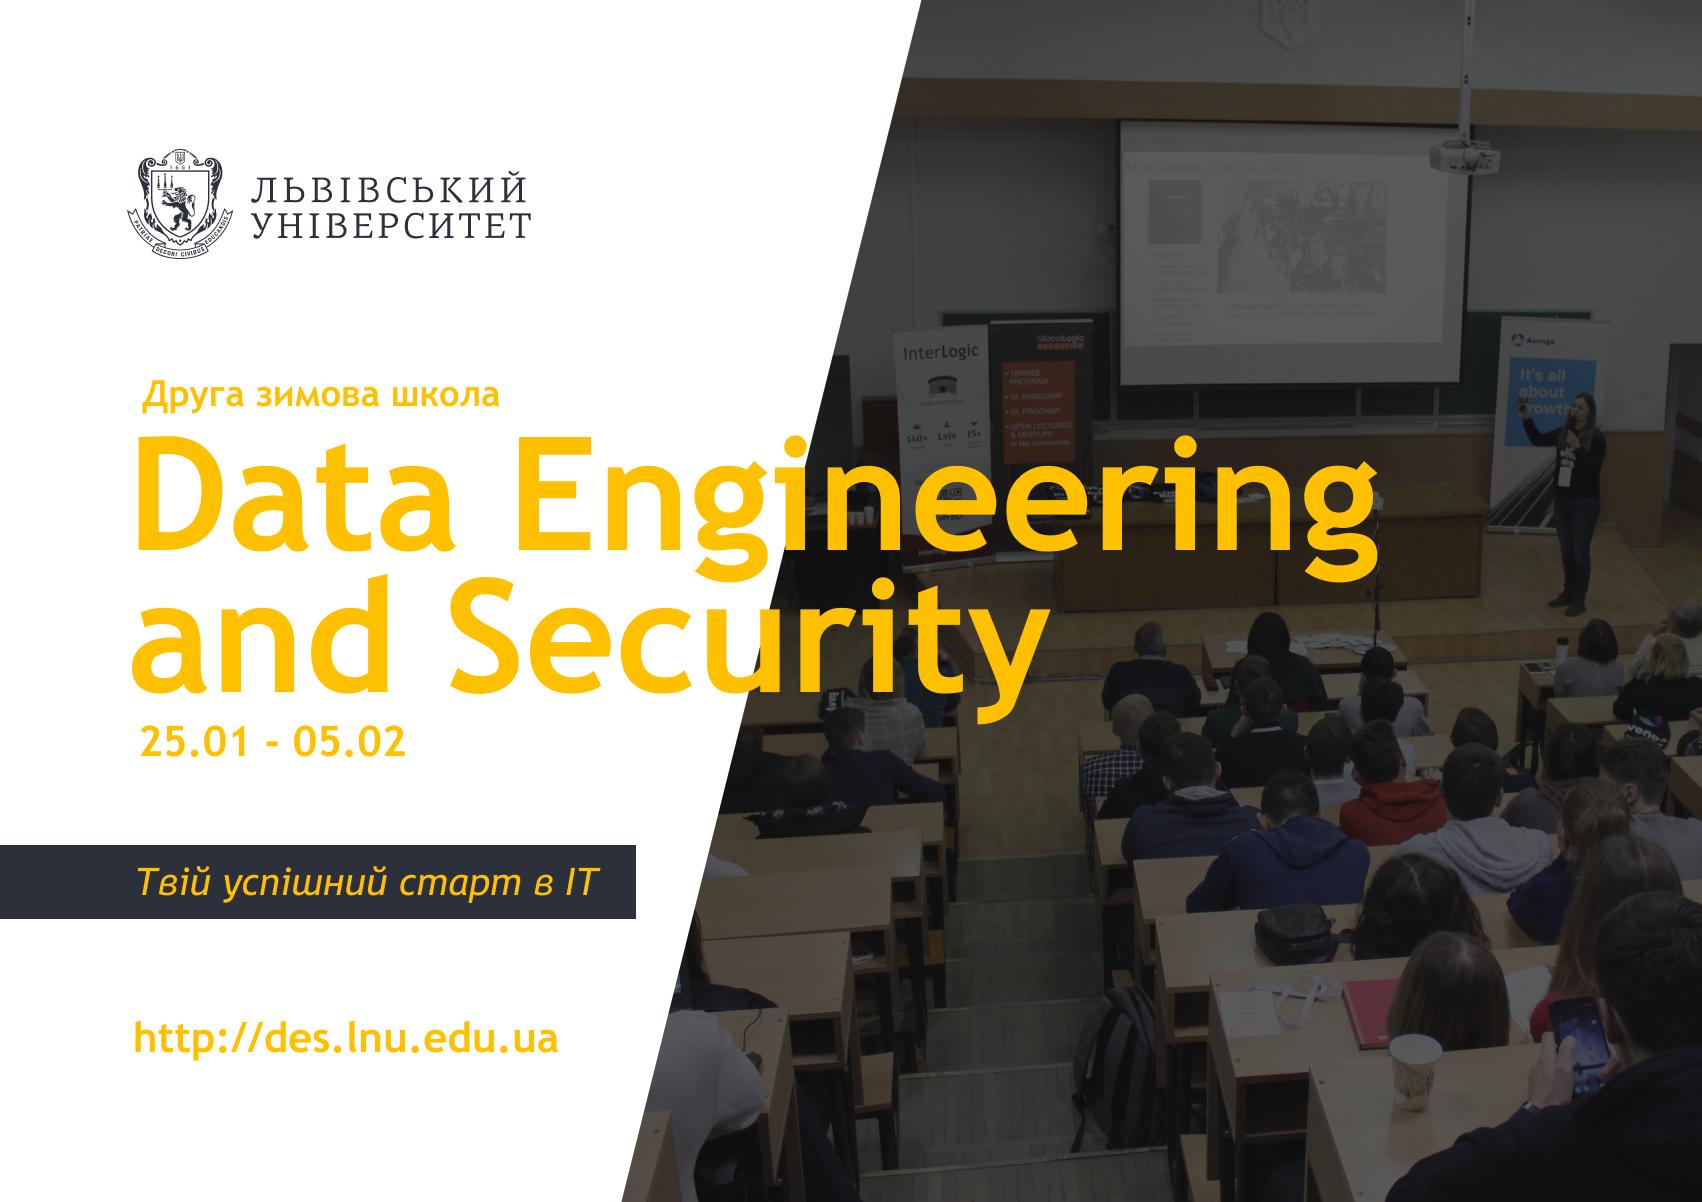 Друга зимова школа DES (Data Engineering and Security) 2021 оголошує набір на навчання!